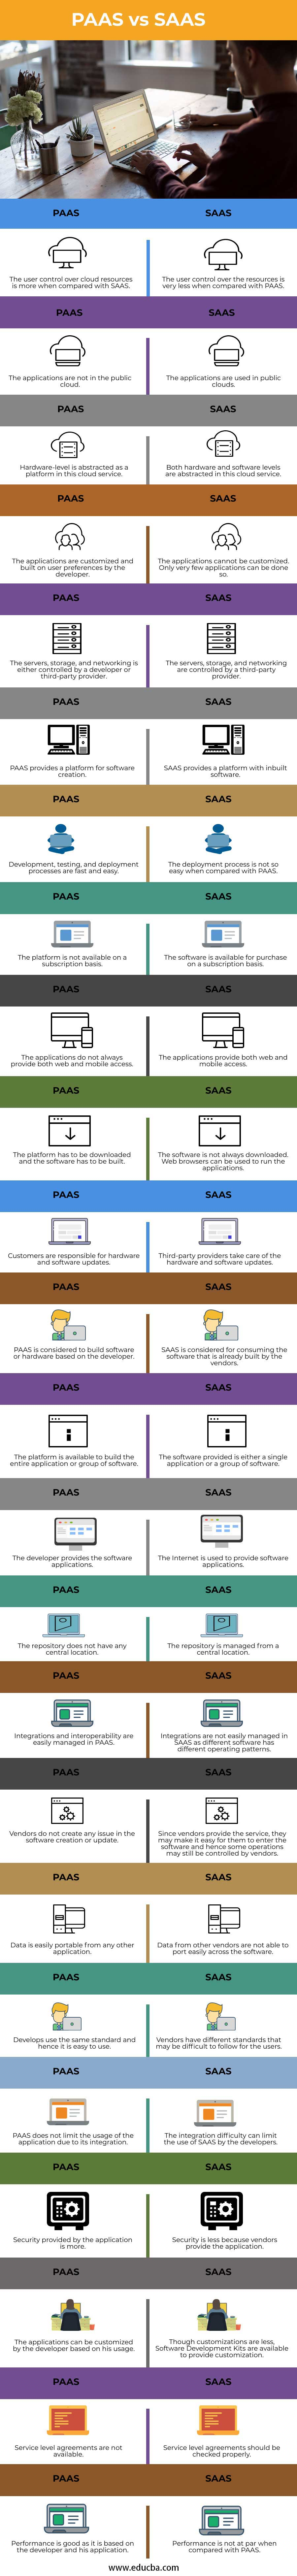 PAAS-vs-SAAS-info